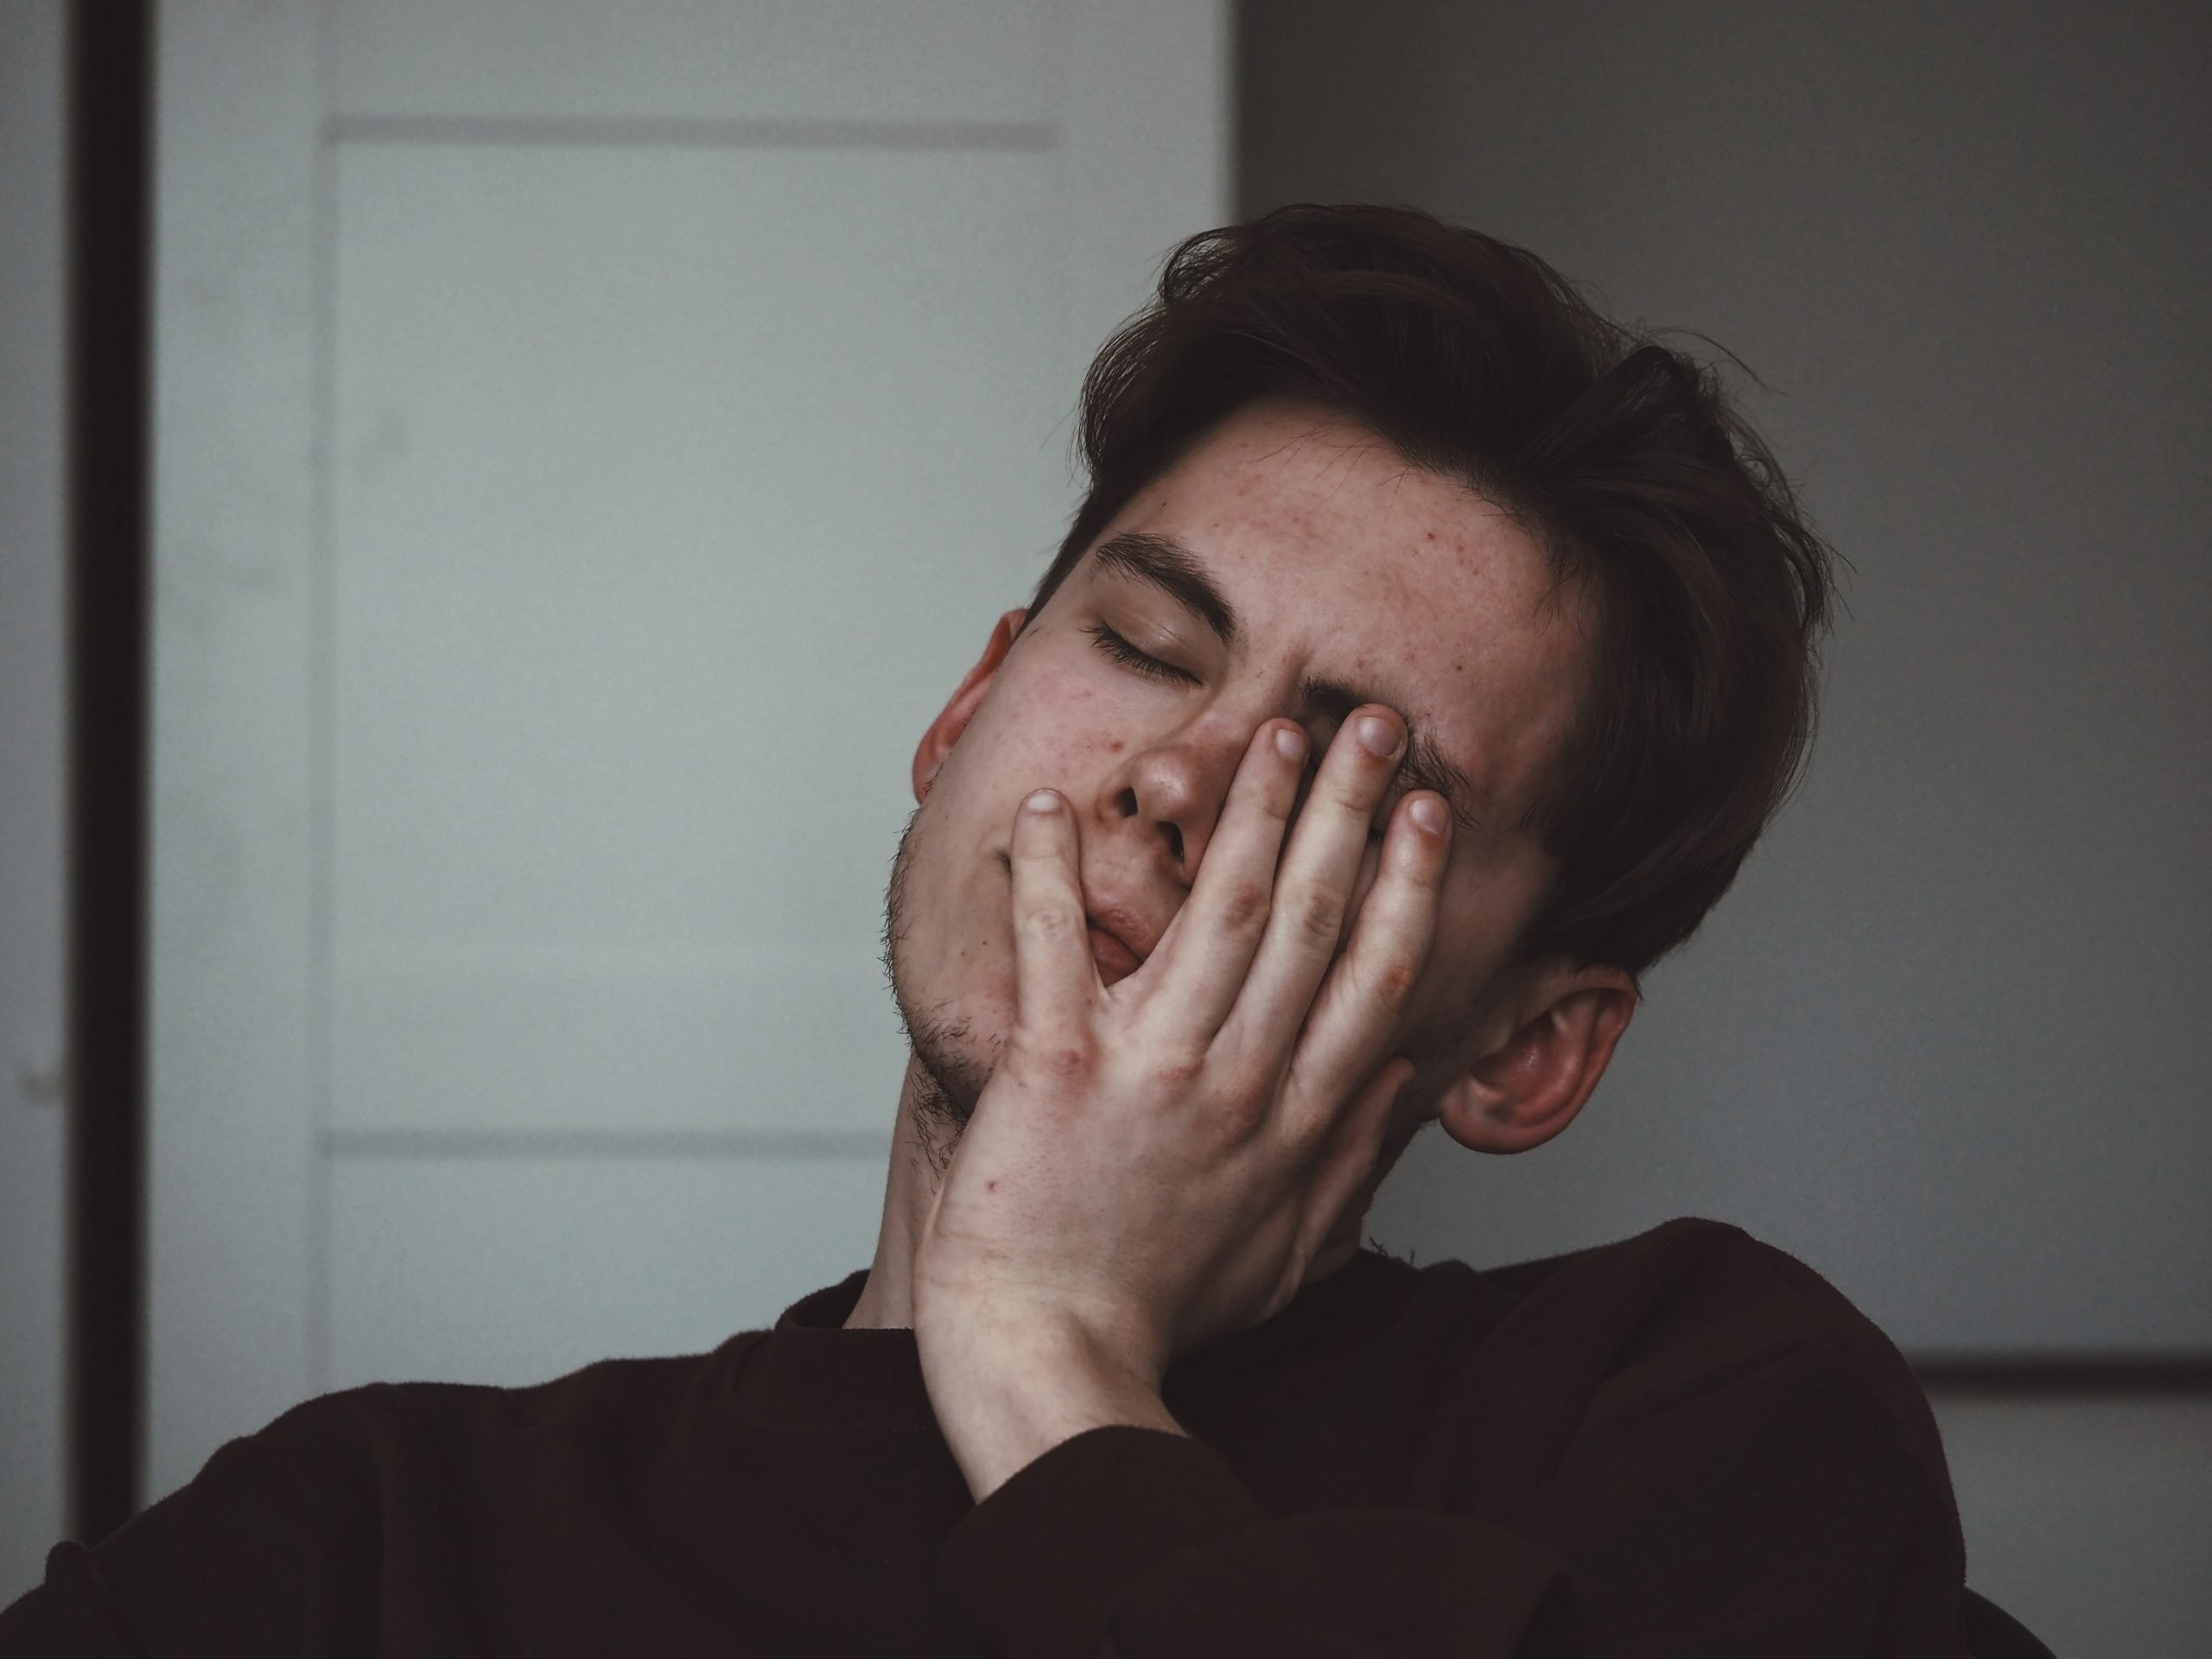 A man experiencing brain fog due to lack of sleep.